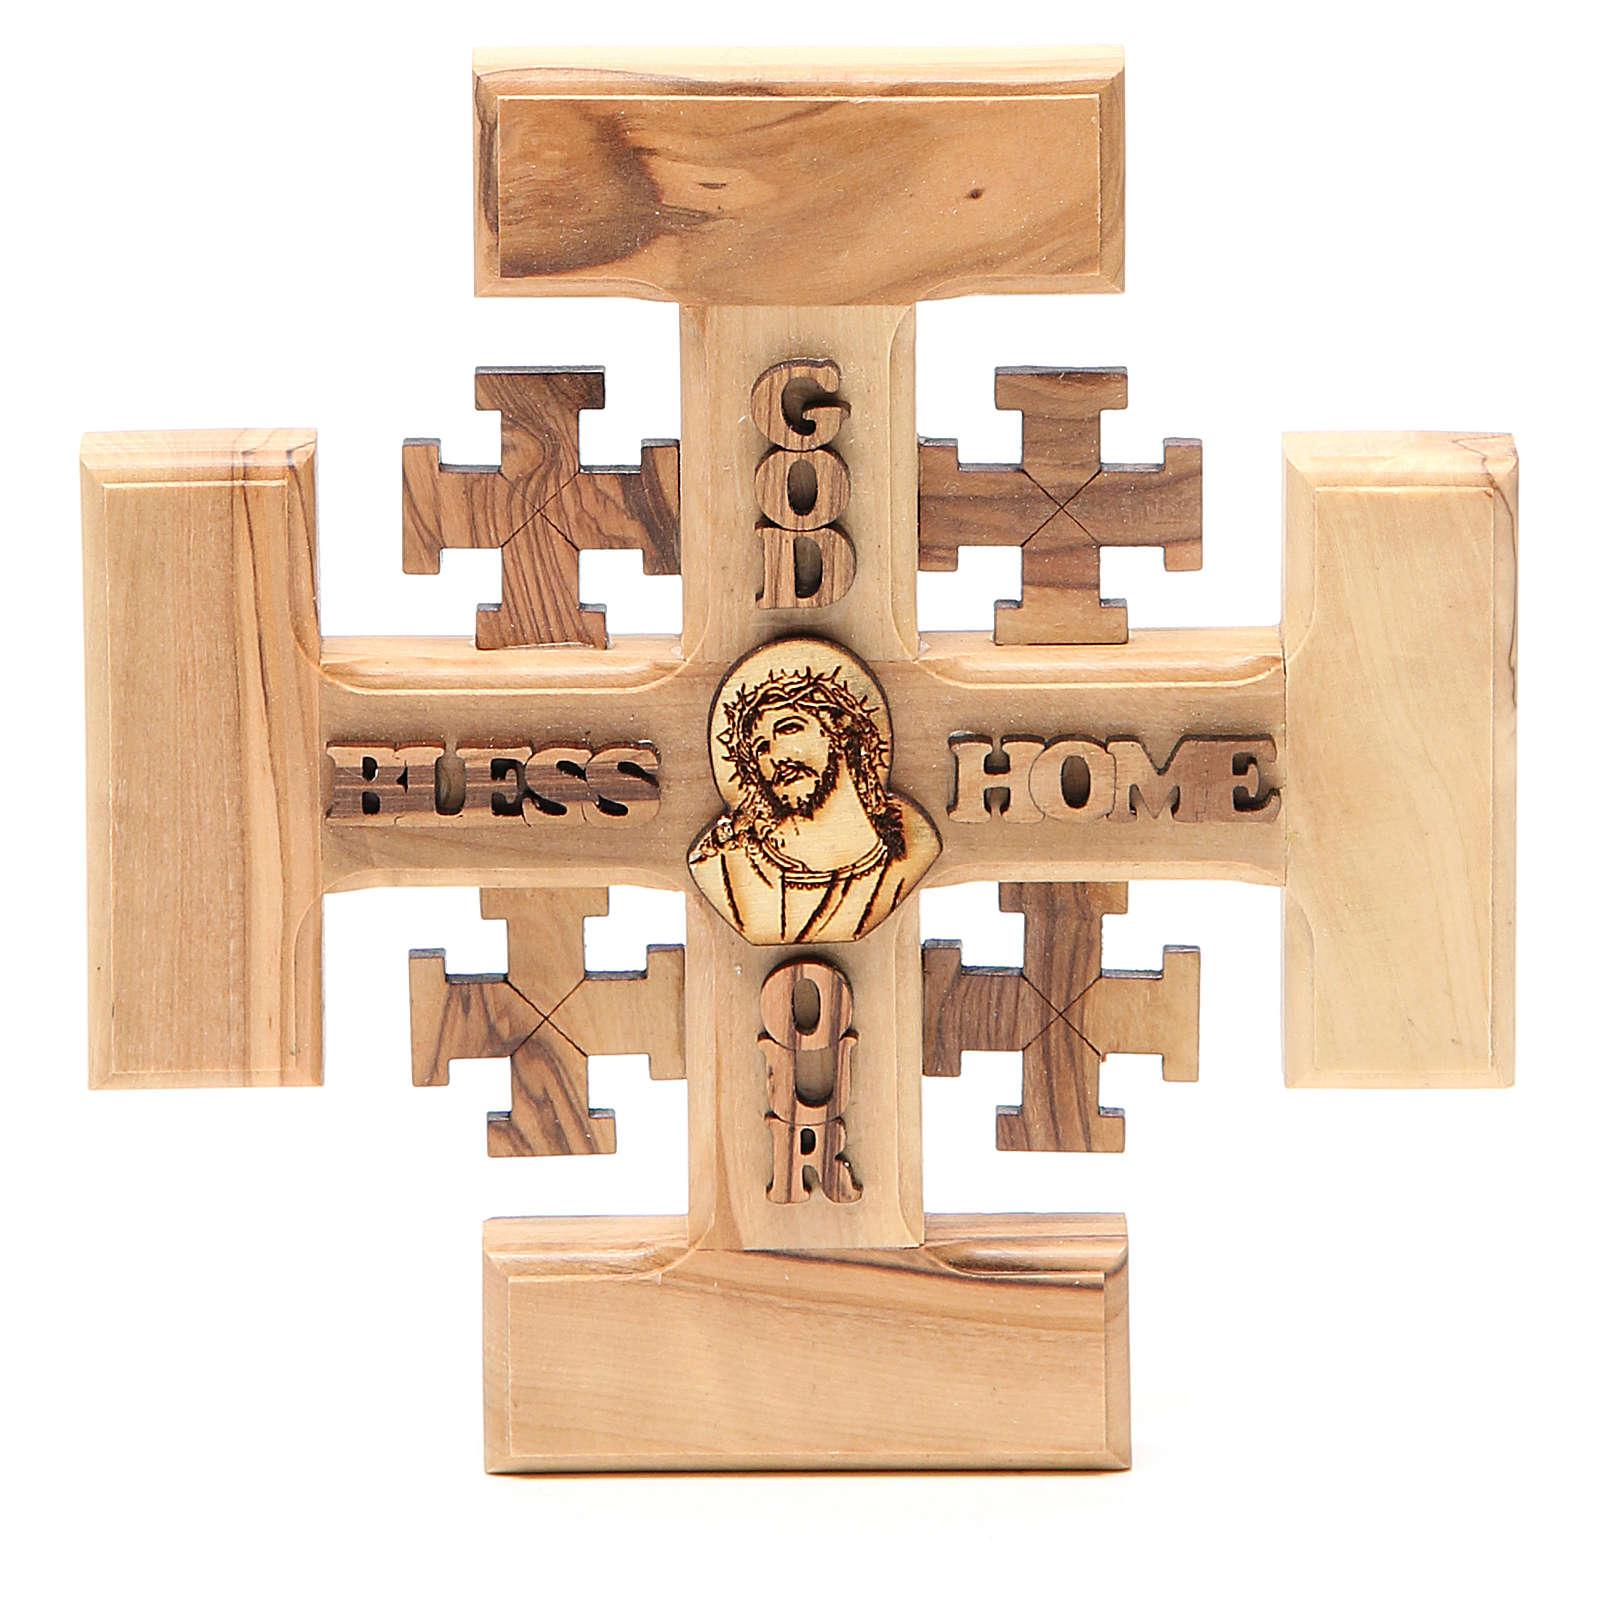 Croce Jerusalem ulivo Terrasanta G.B.O.H. 15 cm 4